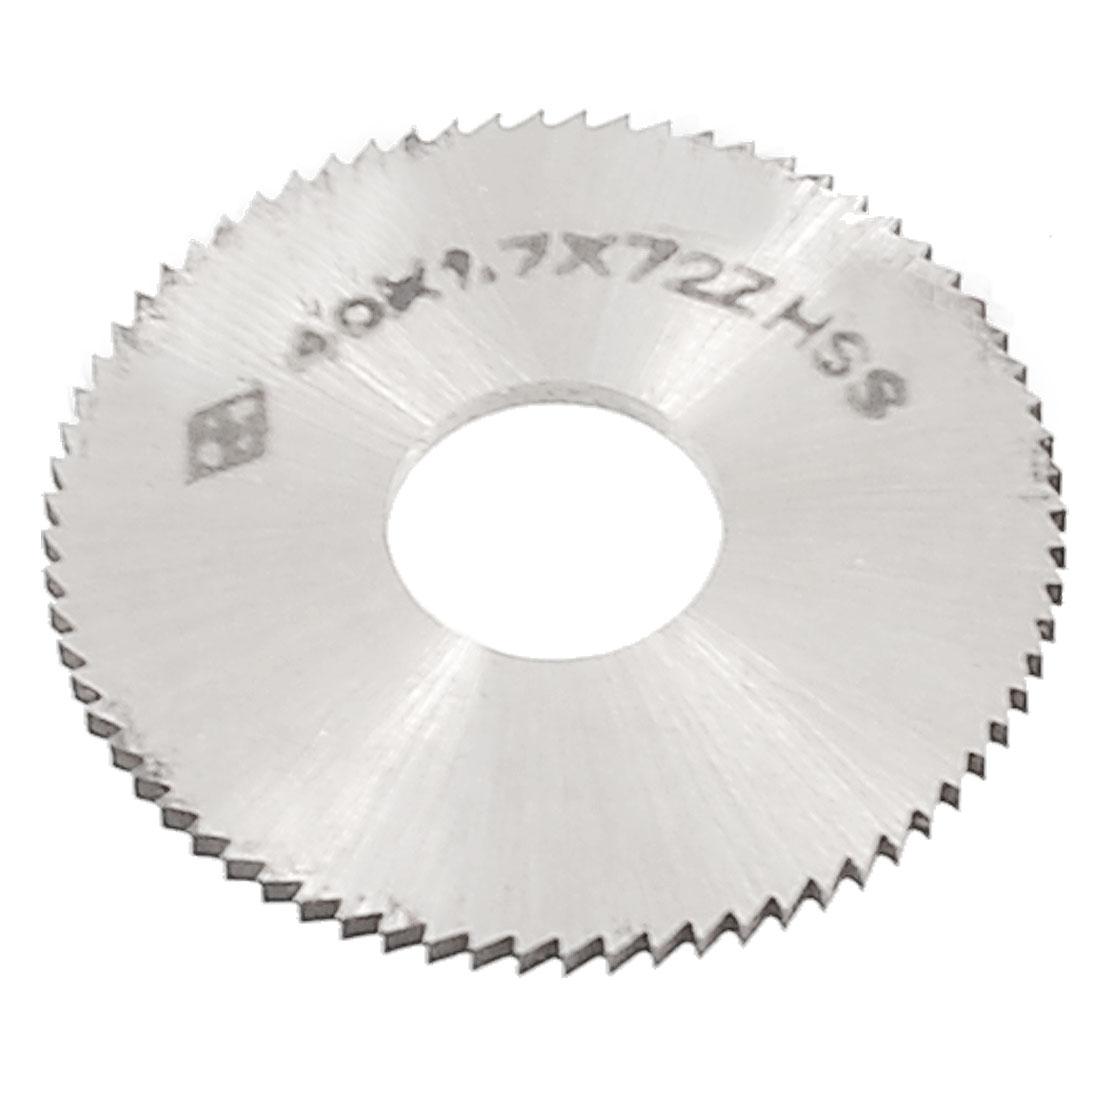 "40mm 1 9/16"" OD 1.7mm Thickness 72T HSS Circular Slitting Saw"